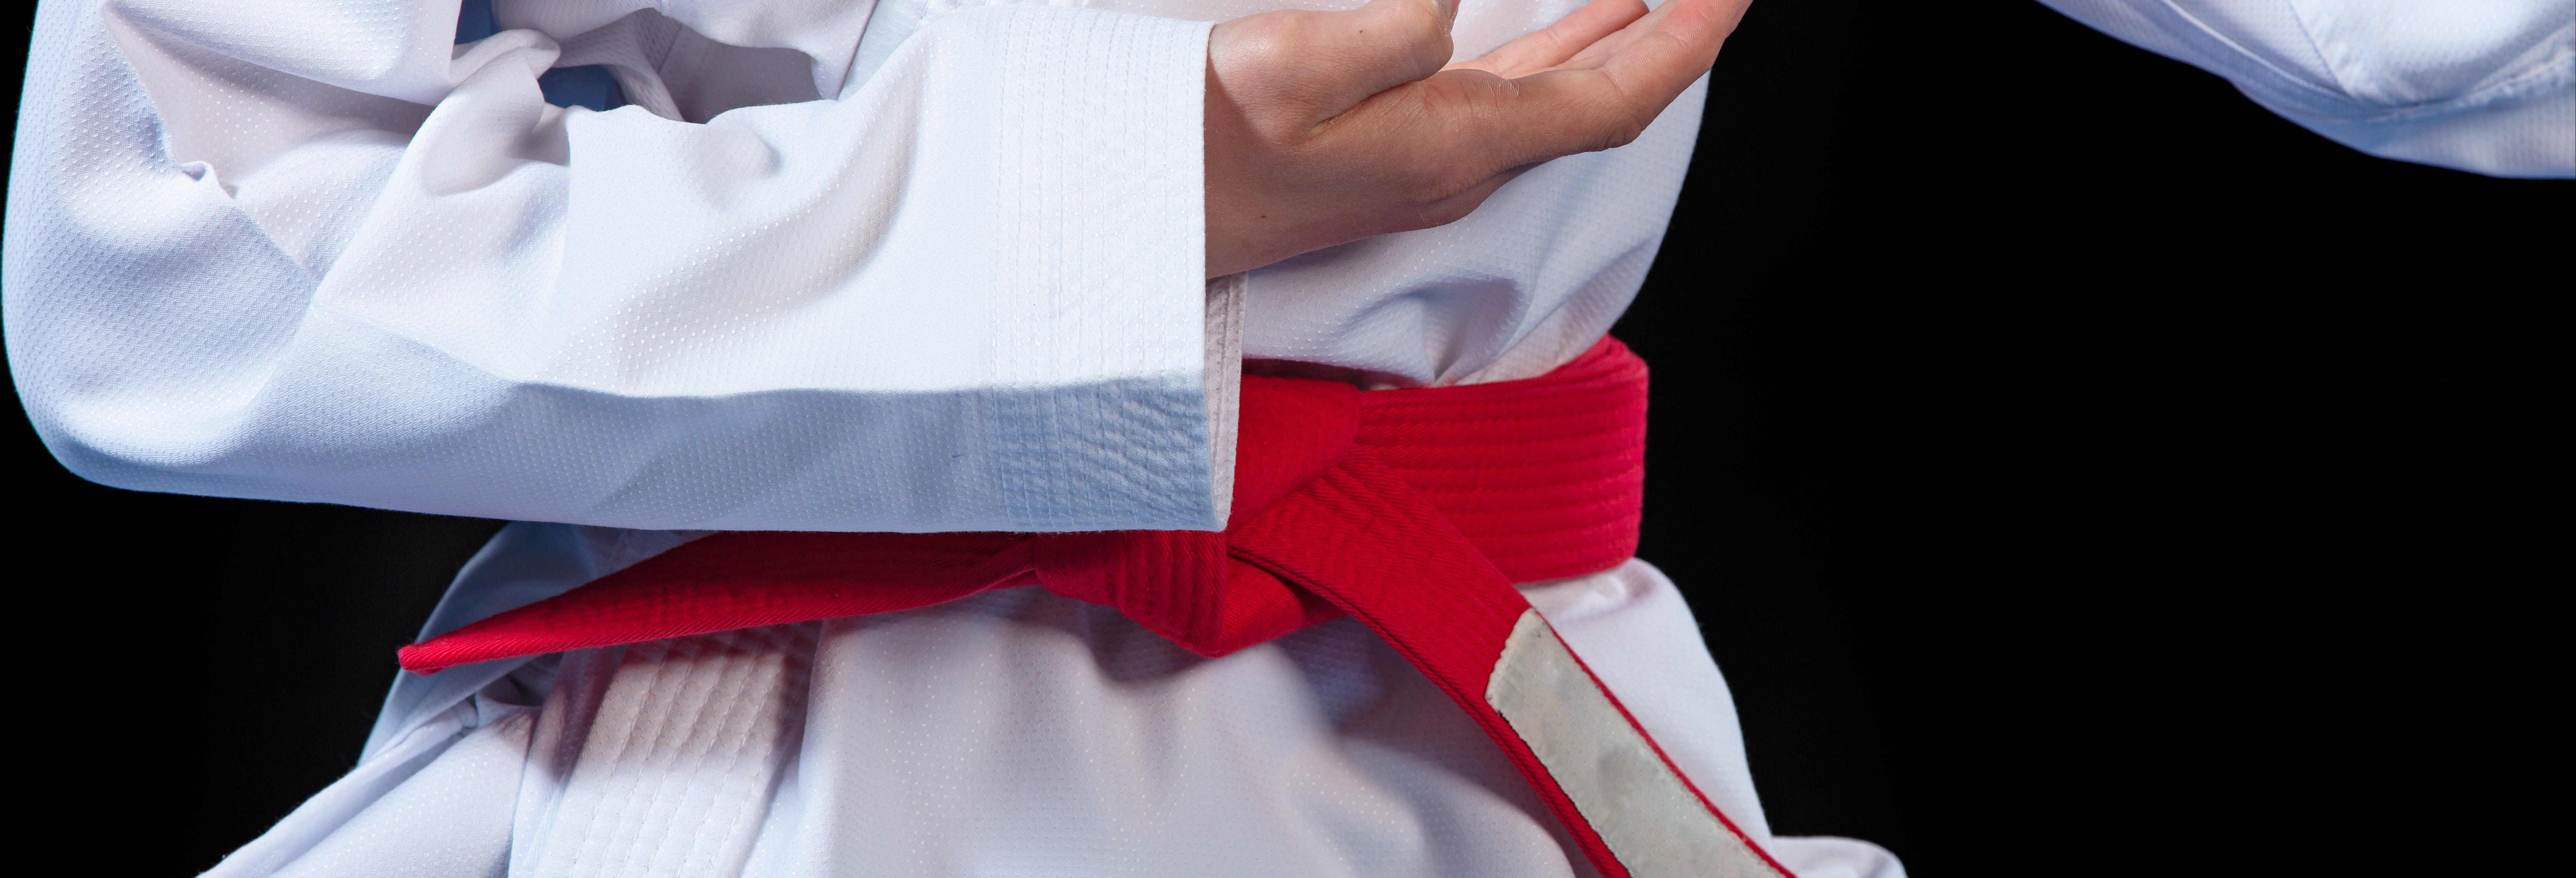 Taekwondo Class in Busan